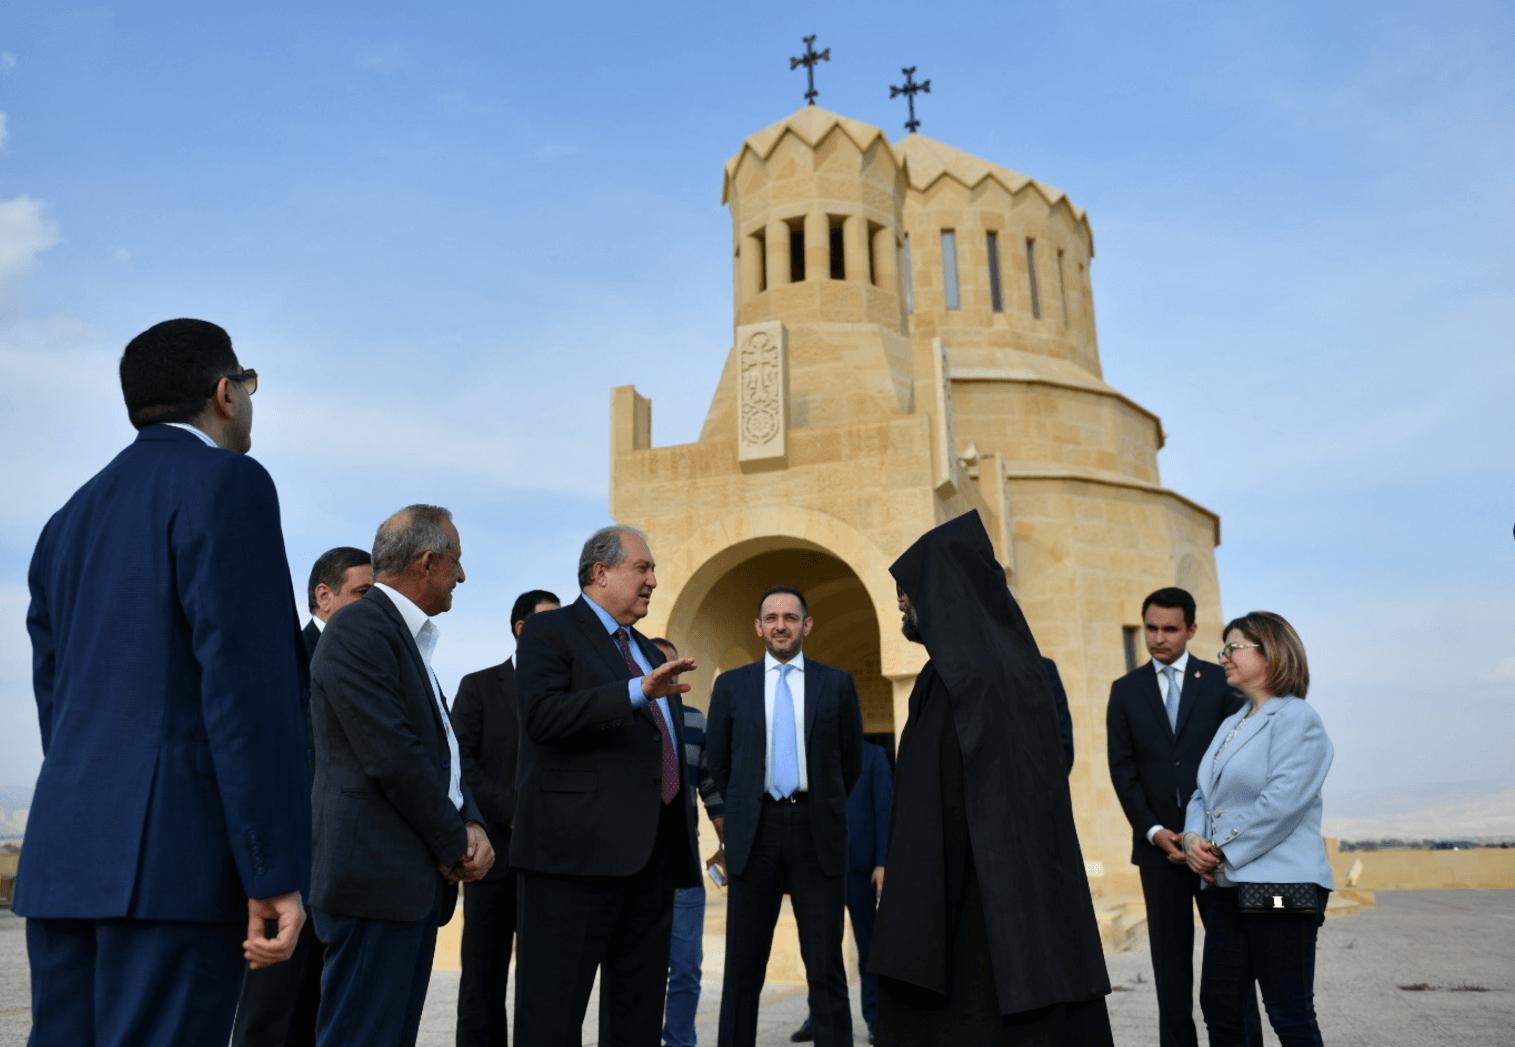 Президент Саргсян посетил место крещения Иисуса Христа на реке Иордан. Фоторяд